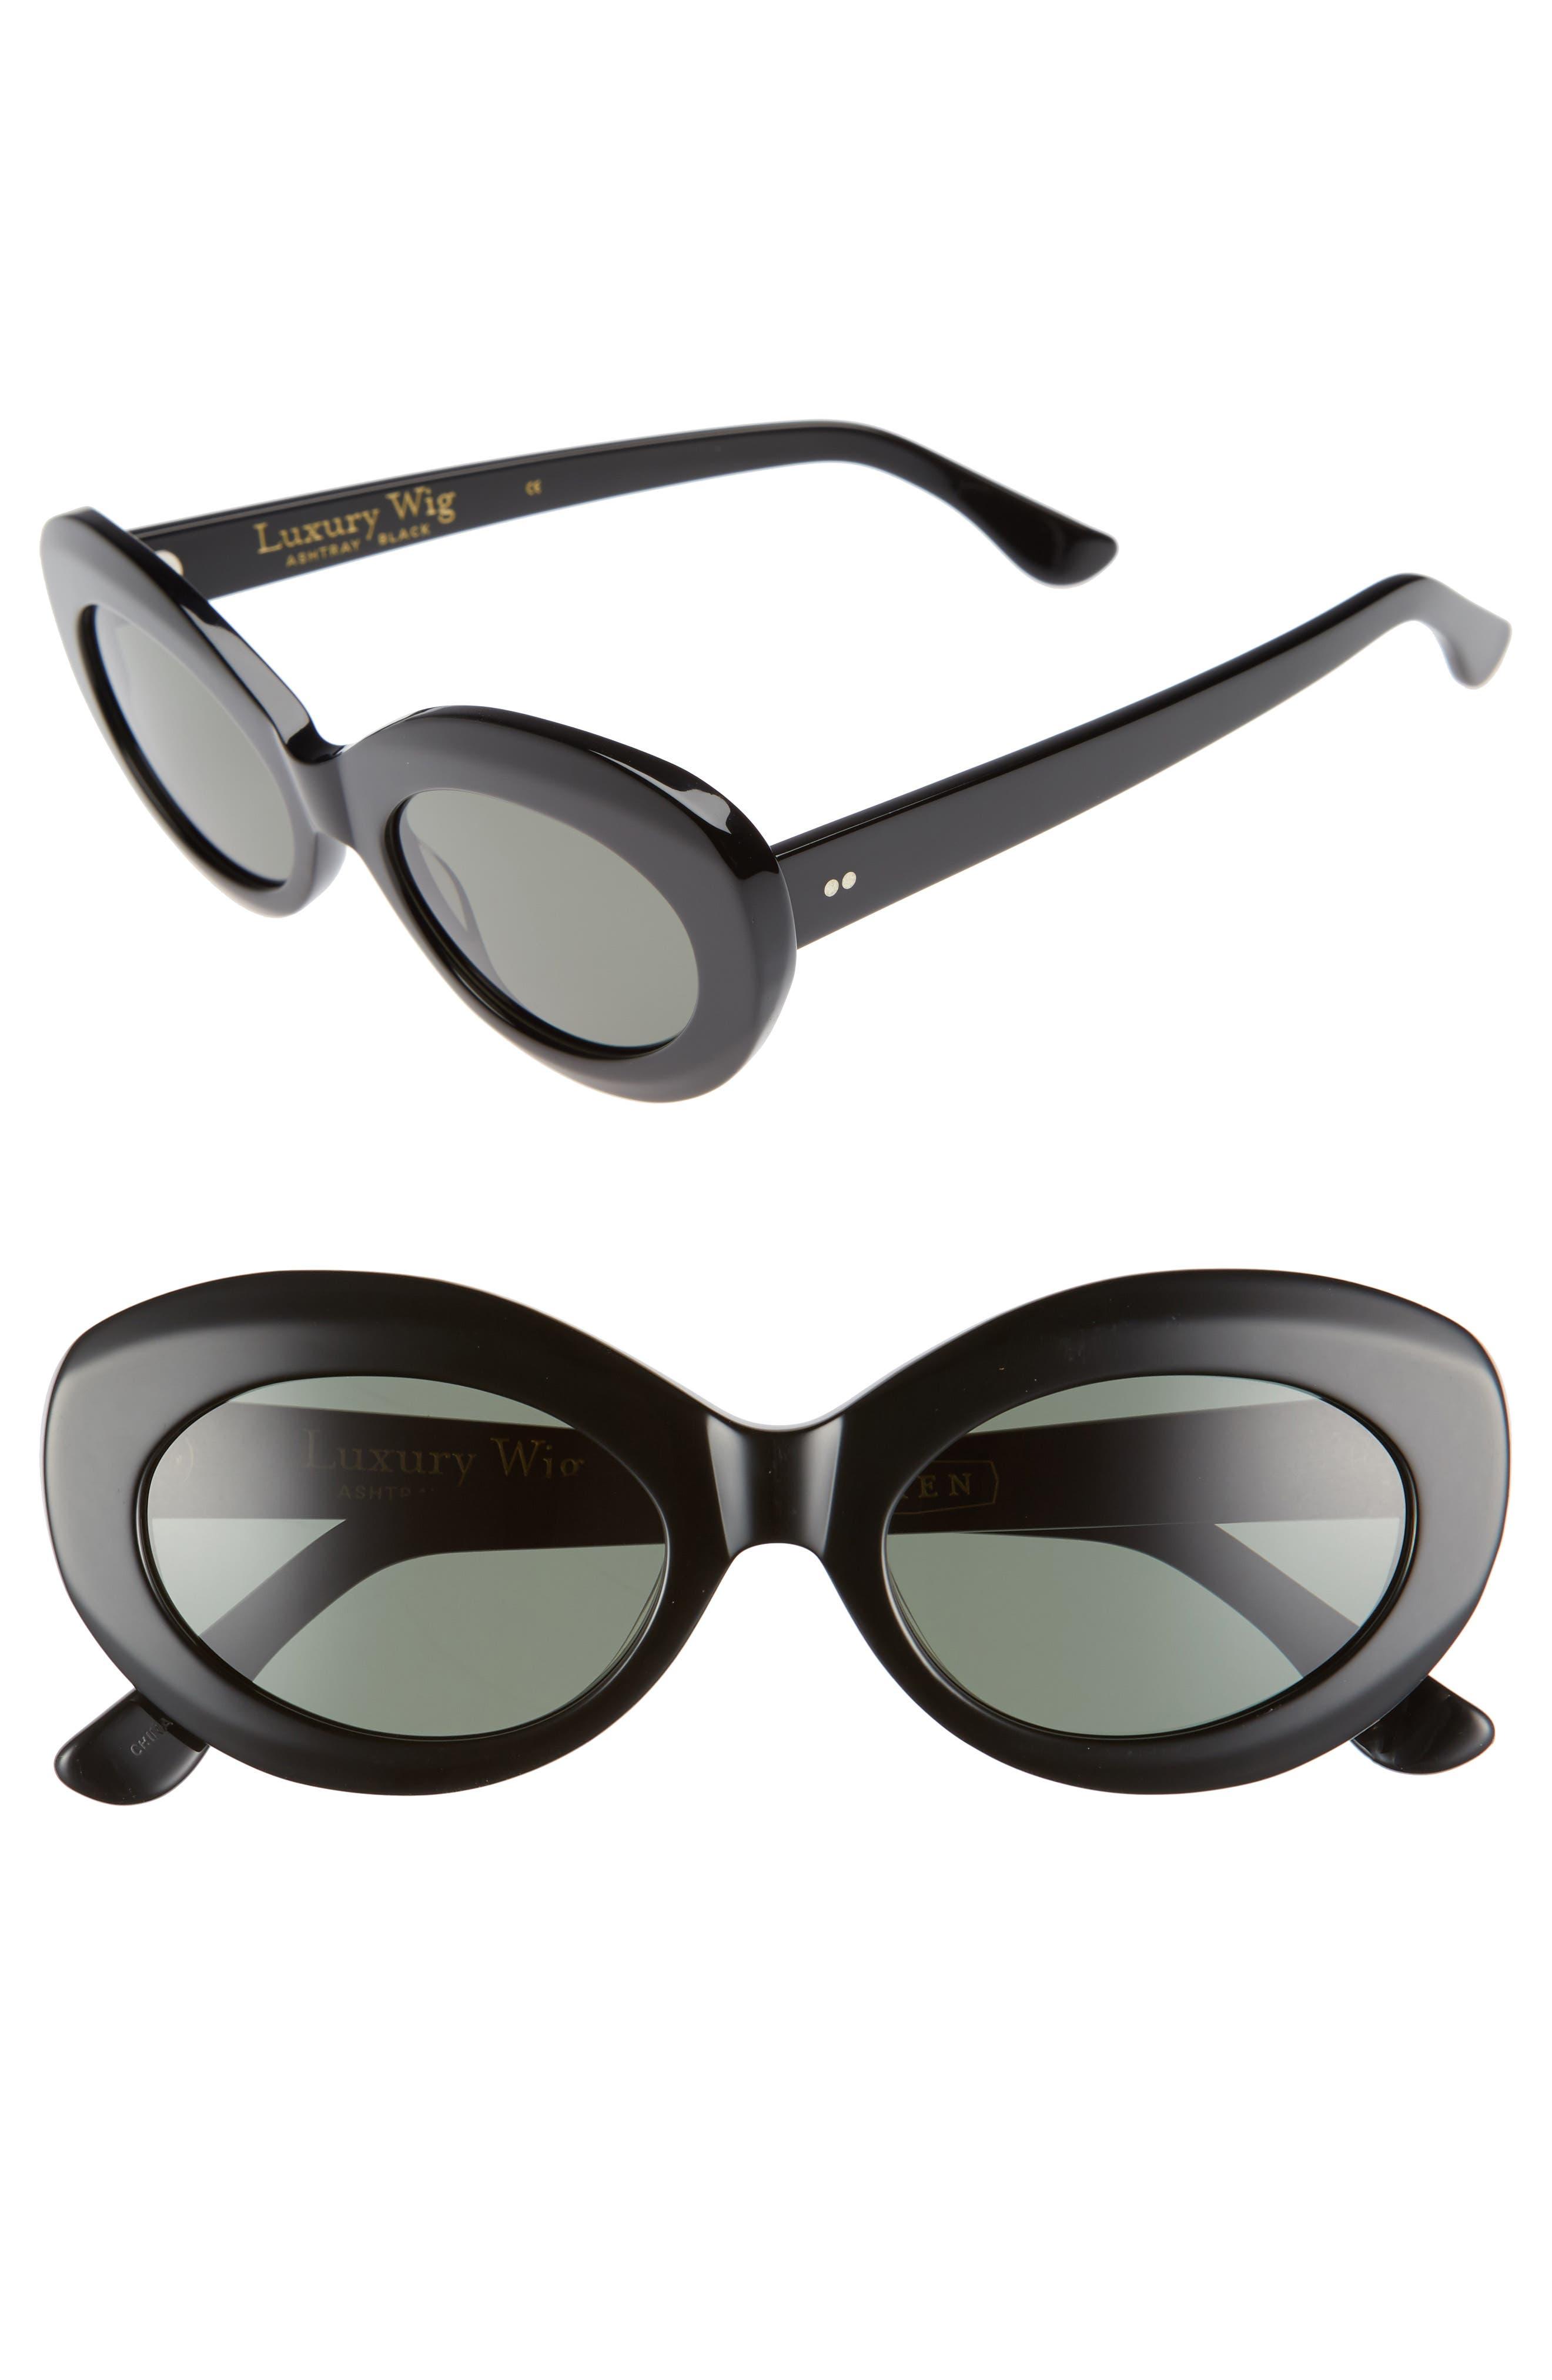 x Alex Knost Luxury Wig Ashtray 53mm Sunglasses,                             Main thumbnail 1, color,                             Black/ Black